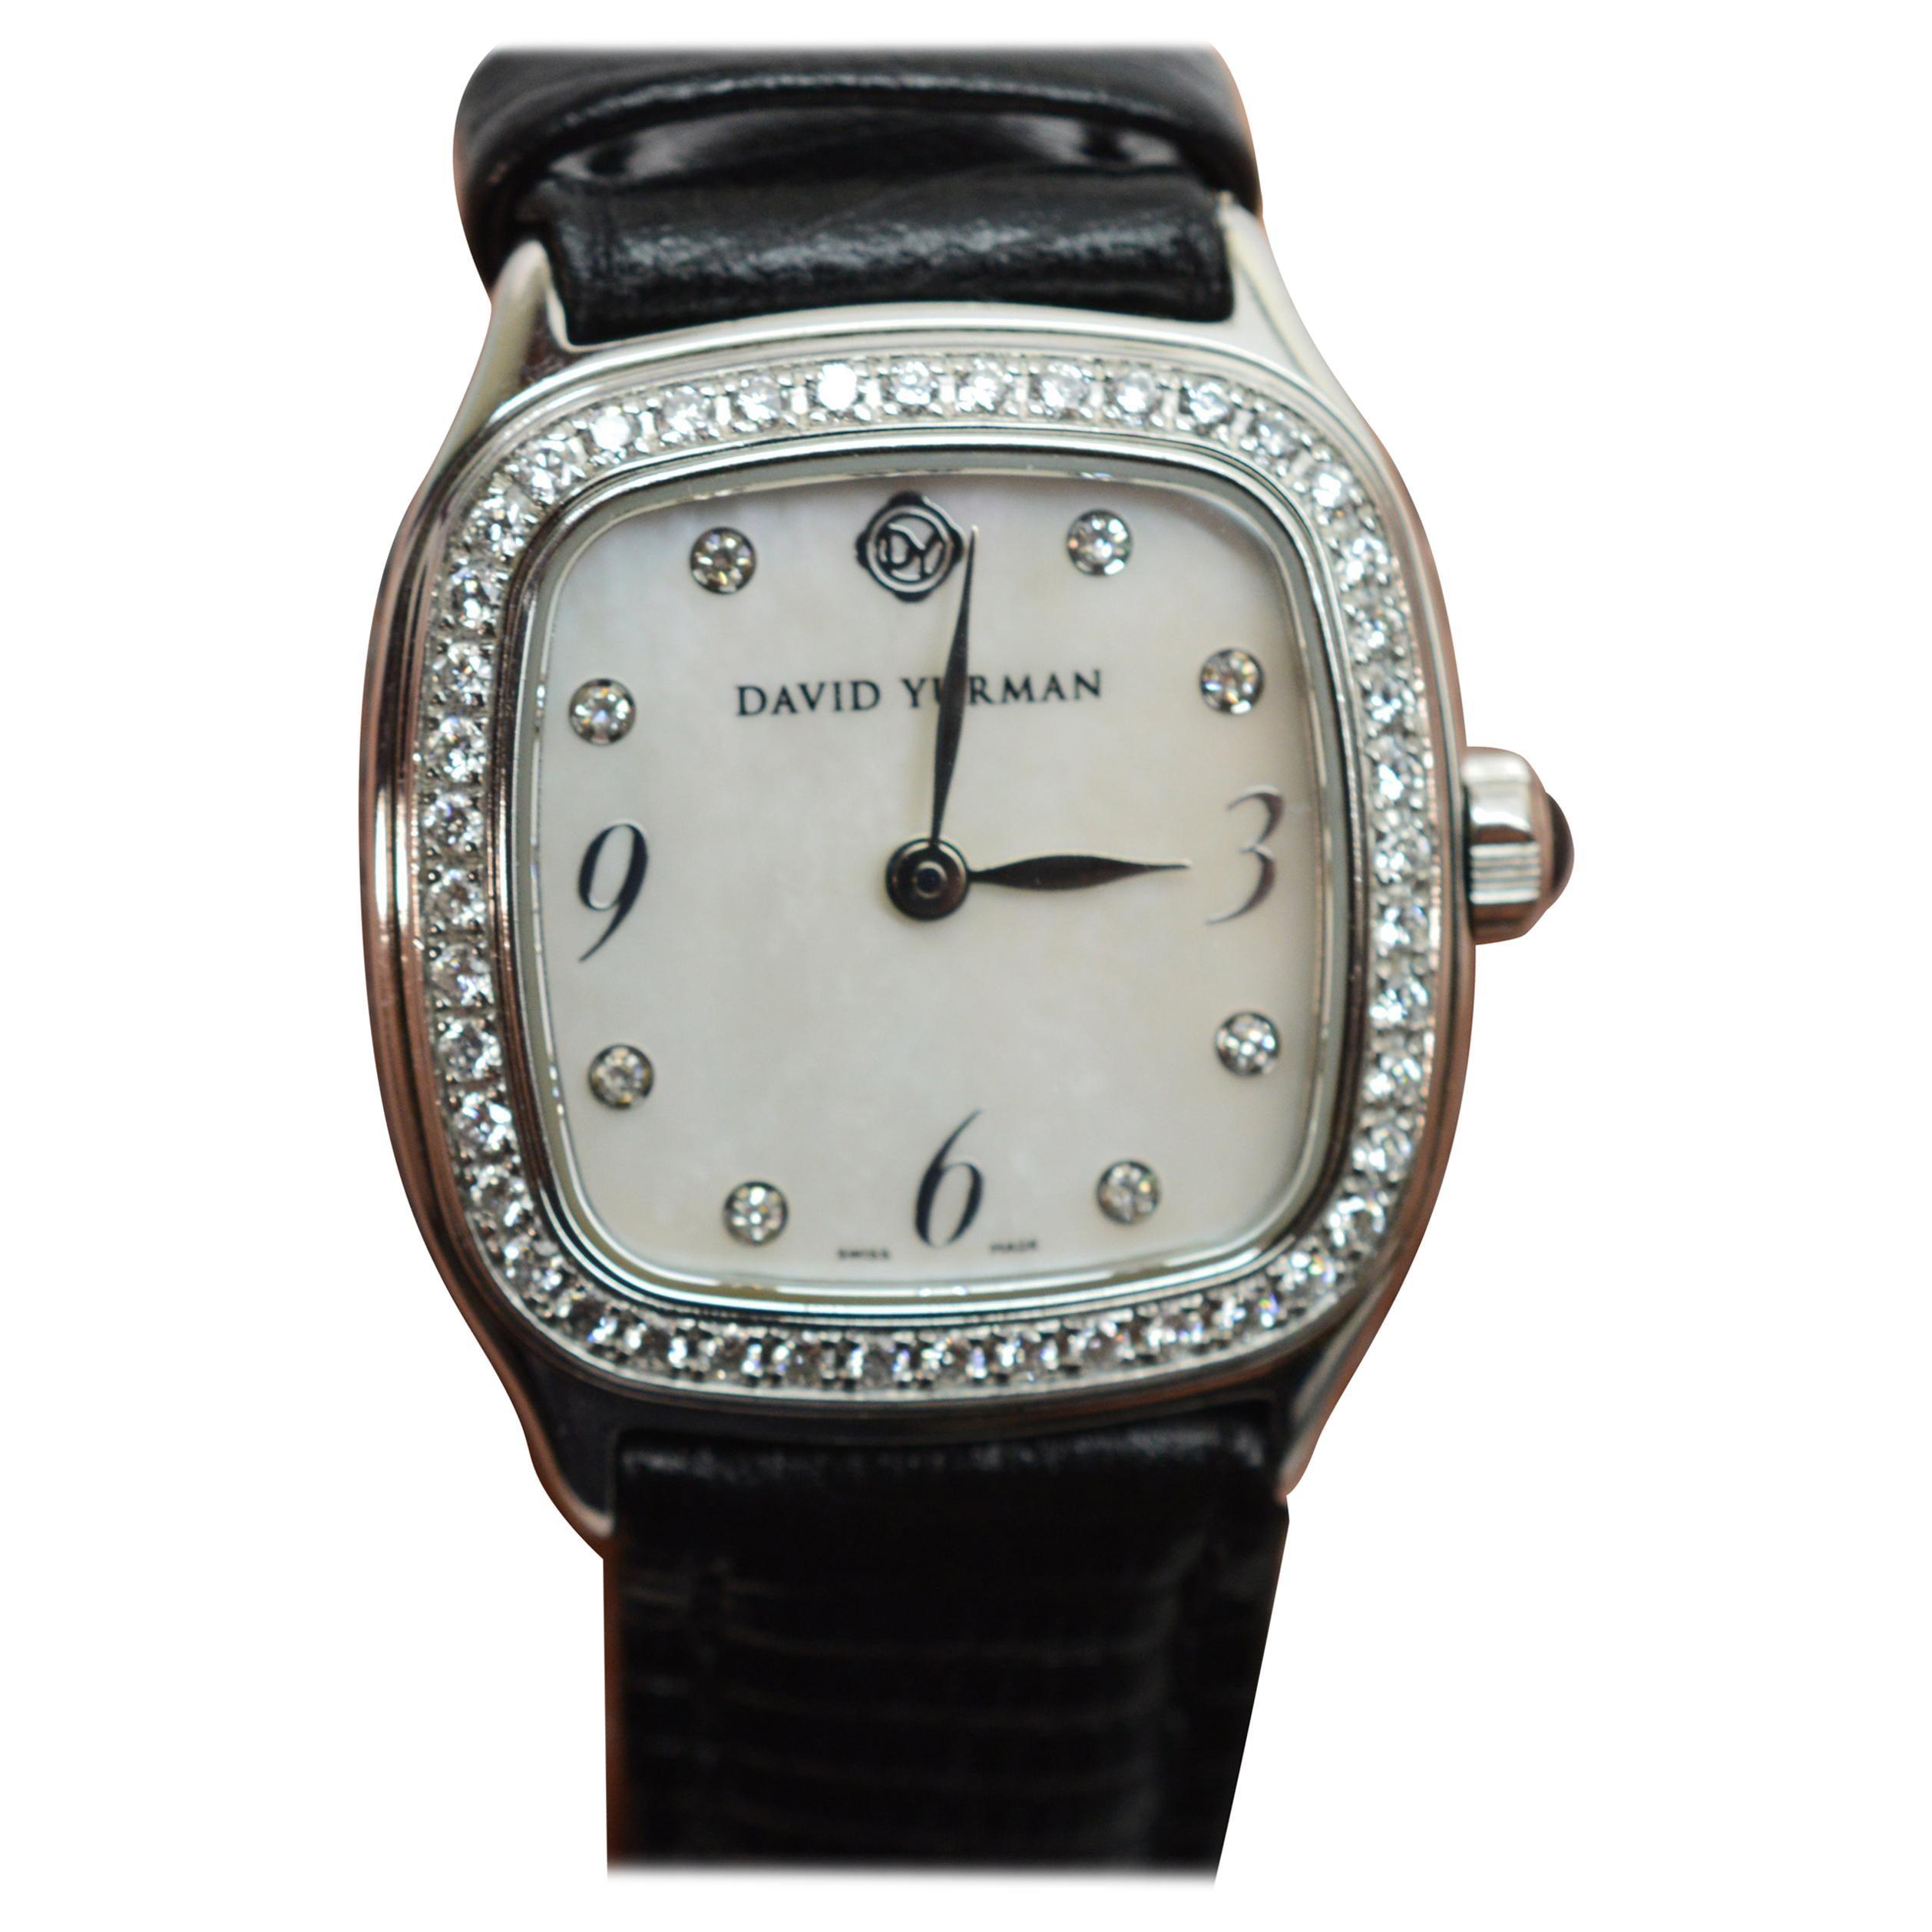 David Yurman Thoroughbred Collection Ladies Stainless Steel Diamond Wrist Watch